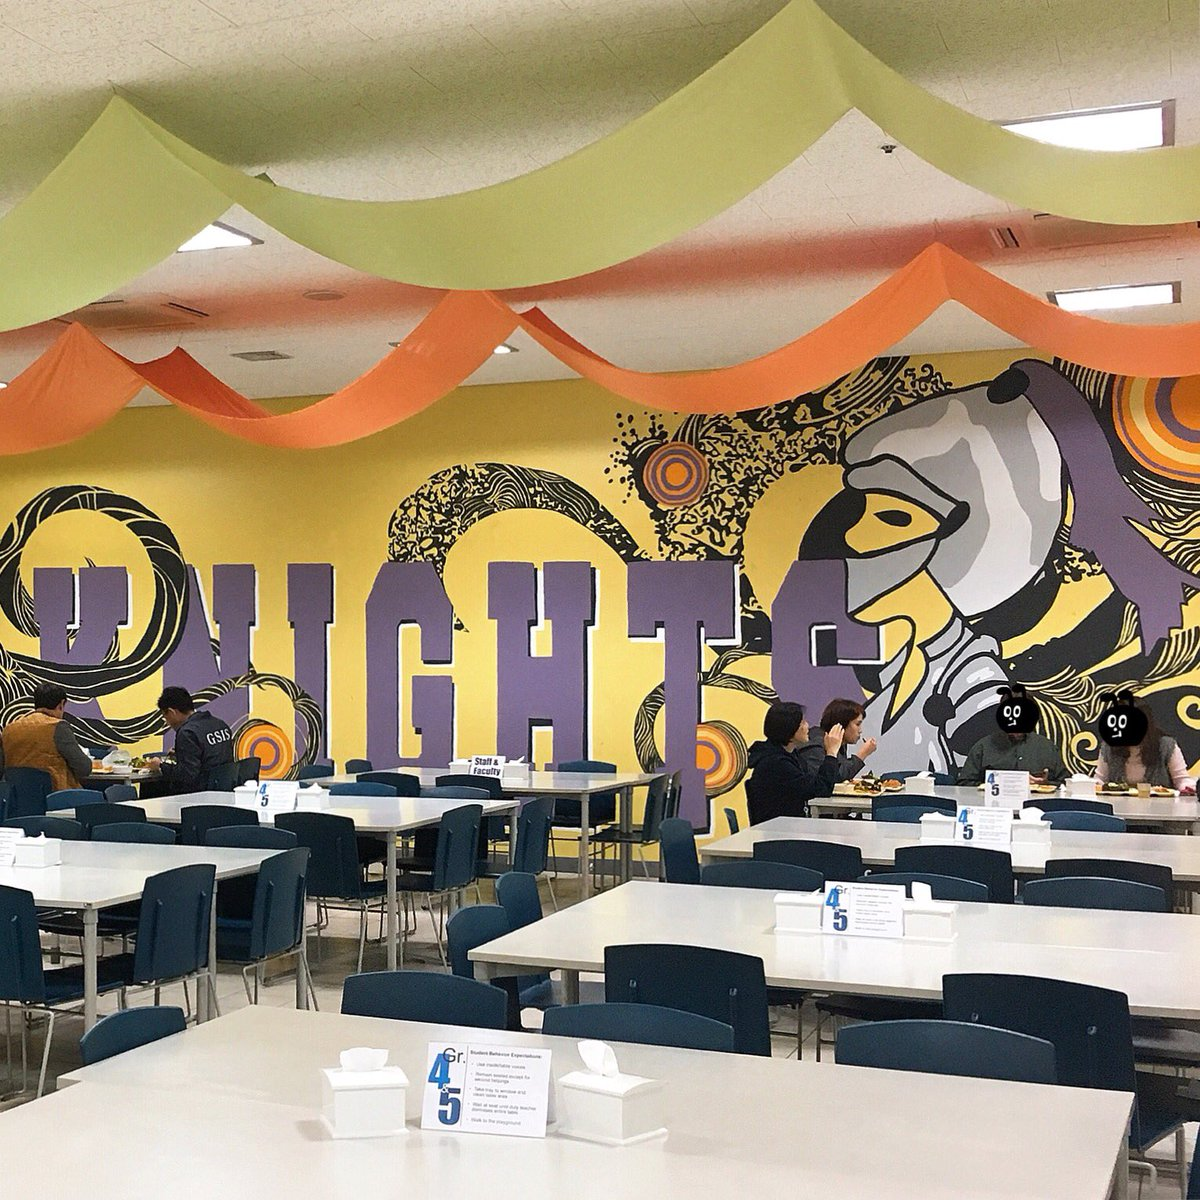 Once a Knight, always a Knight! @GSISKorea #KnightsROK #homeoftheknights #GSIS #fantastic #artwork #colorful #mural #imlovinit #예술이야 #좋다좋아 <br>http://pic.twitter.com/8O4IipzQOD